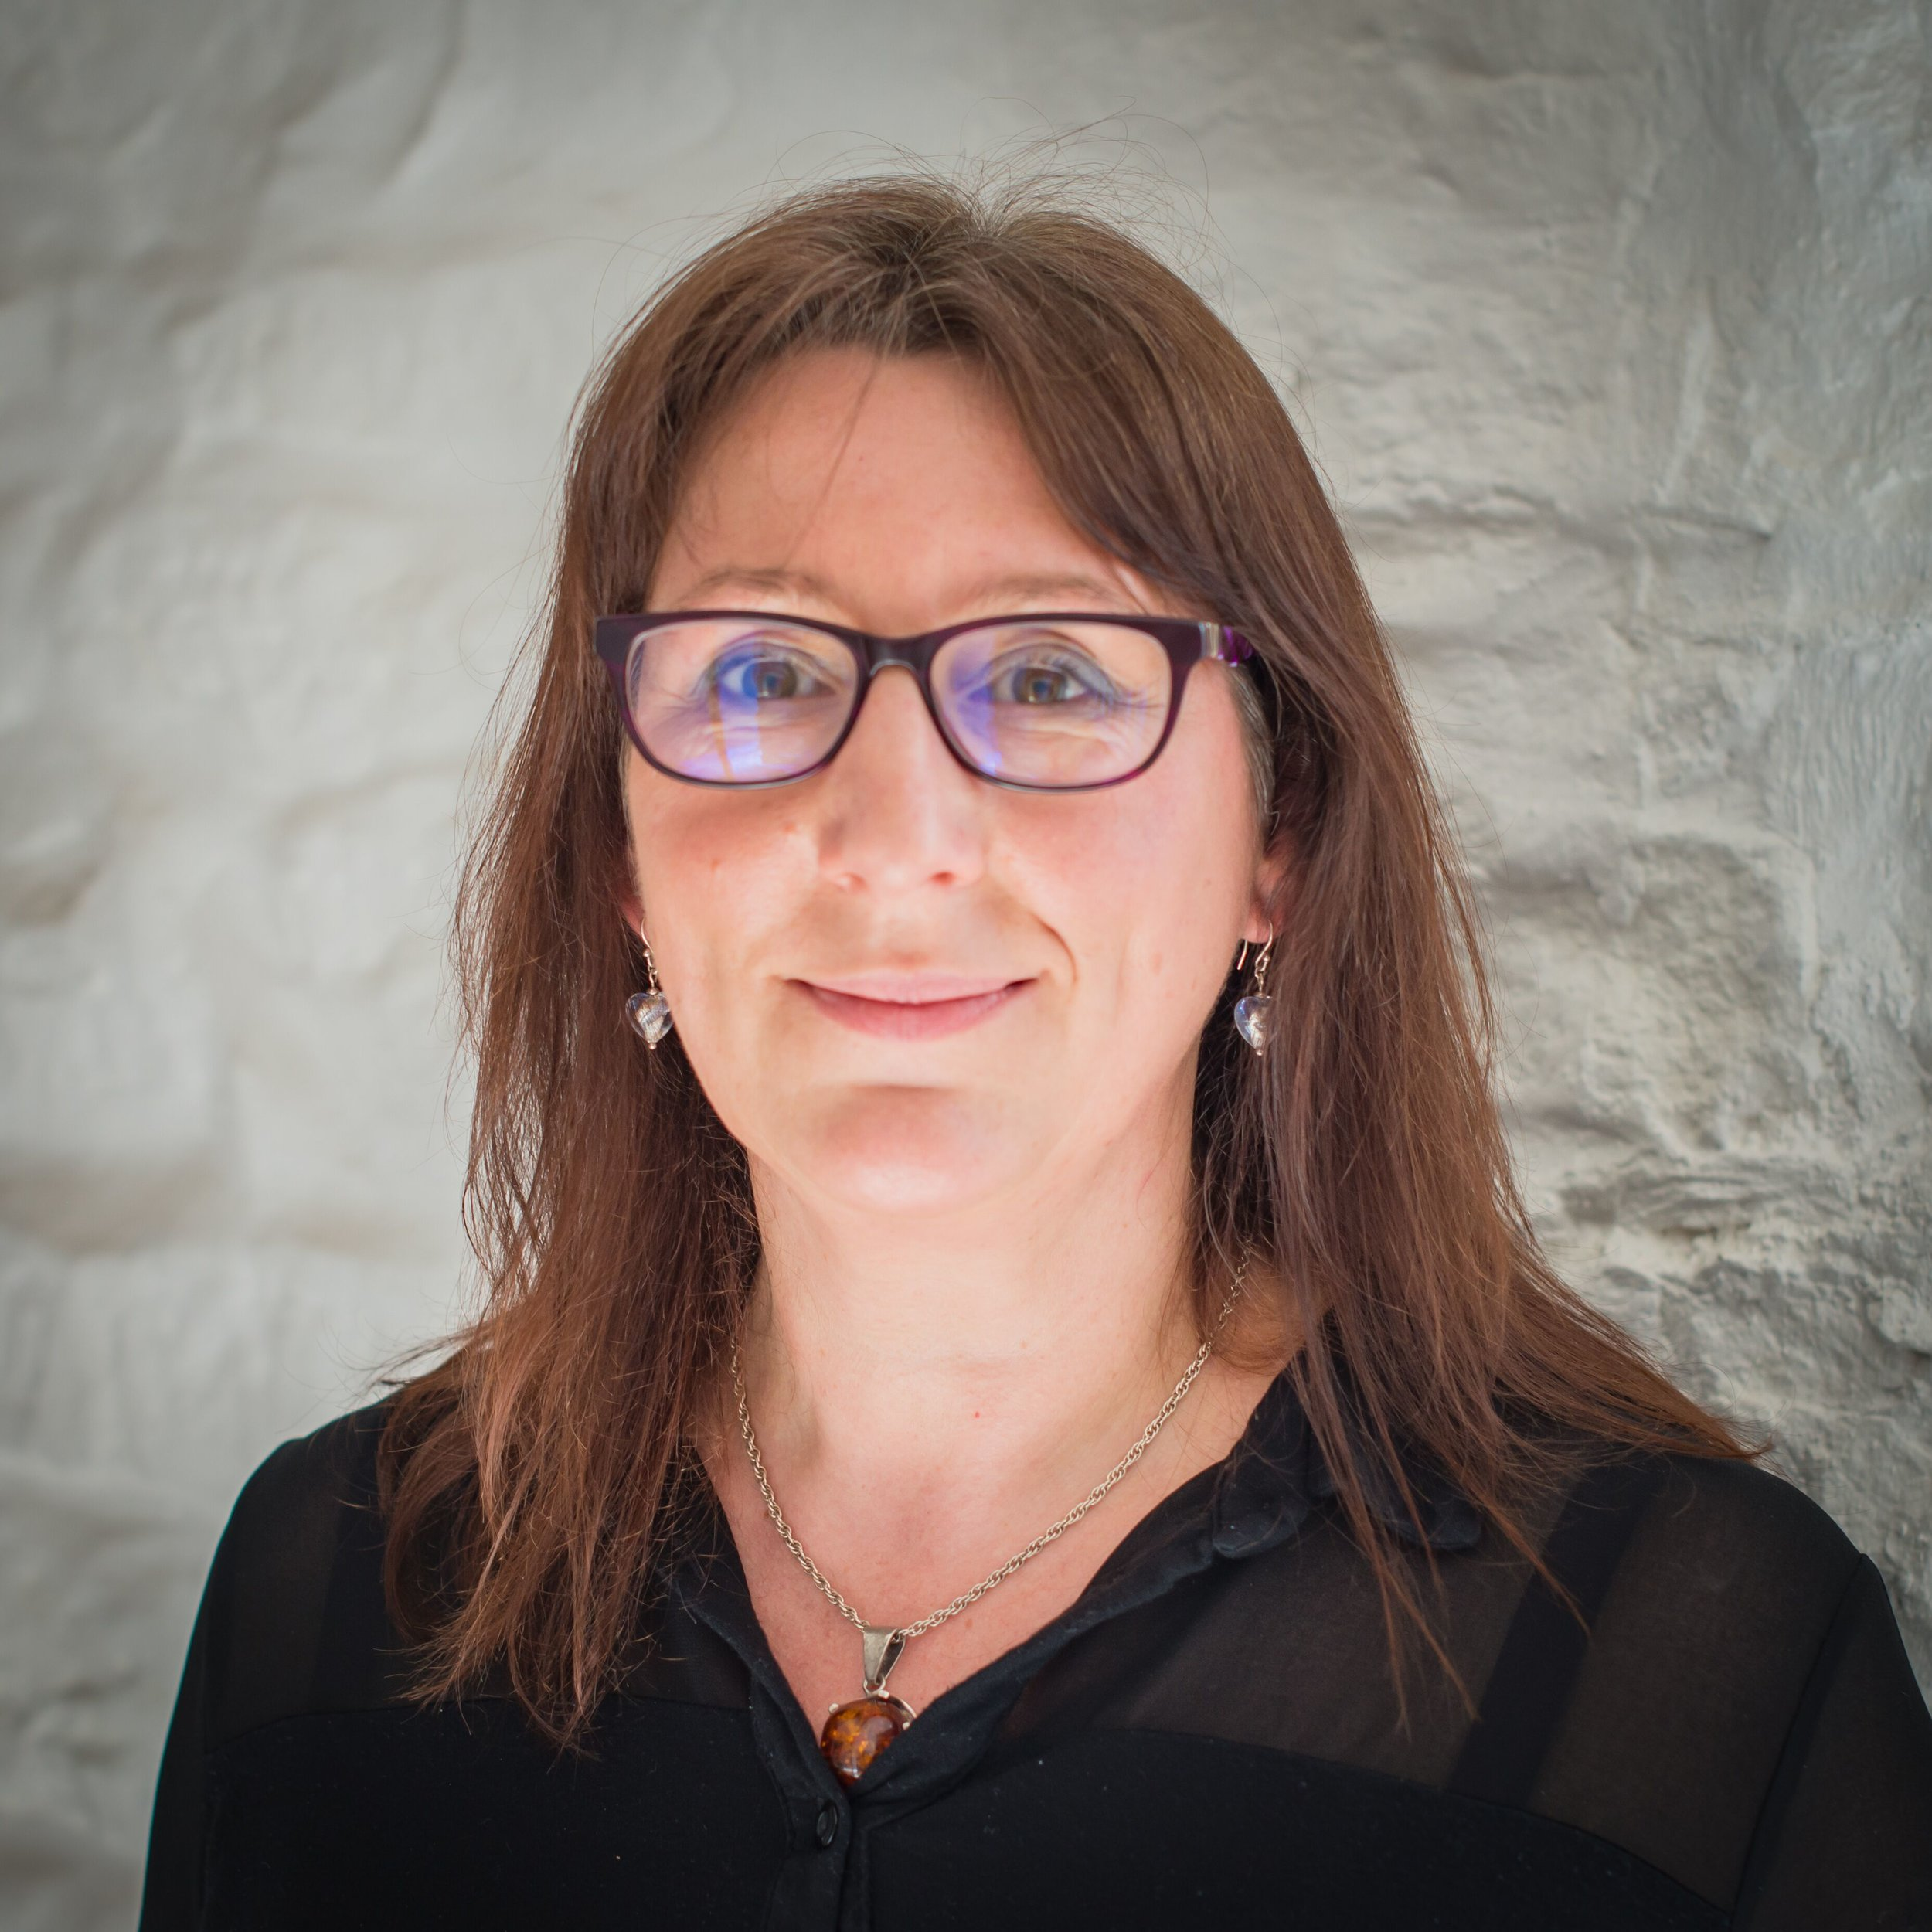 Christine Jackson - Clinical Reflexologist, BSc (hons) BA (hons) MAR CNHC